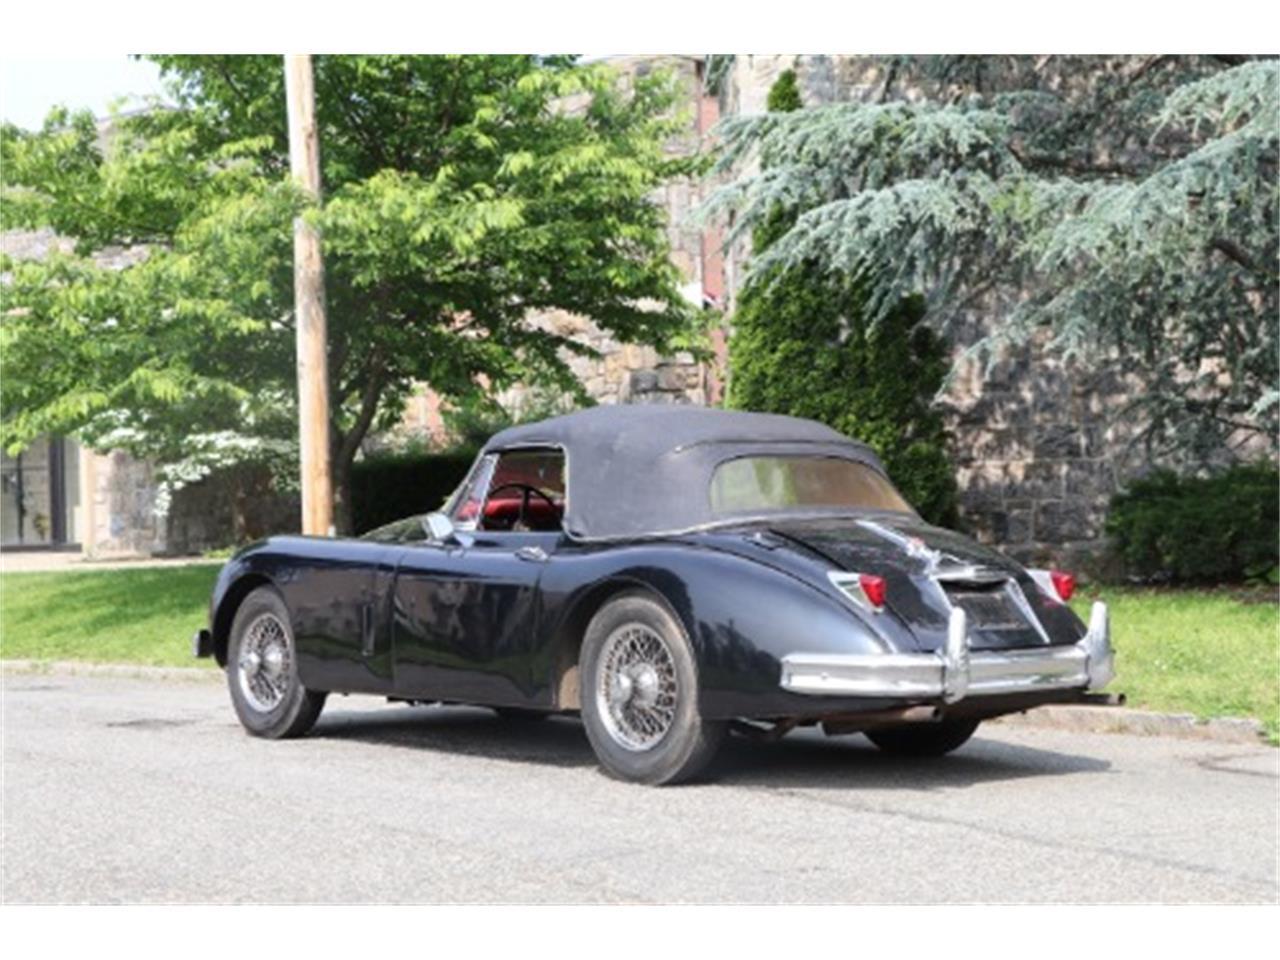 1959 Jaguar XK150 (CC-1225887) for sale in Astoria, New York